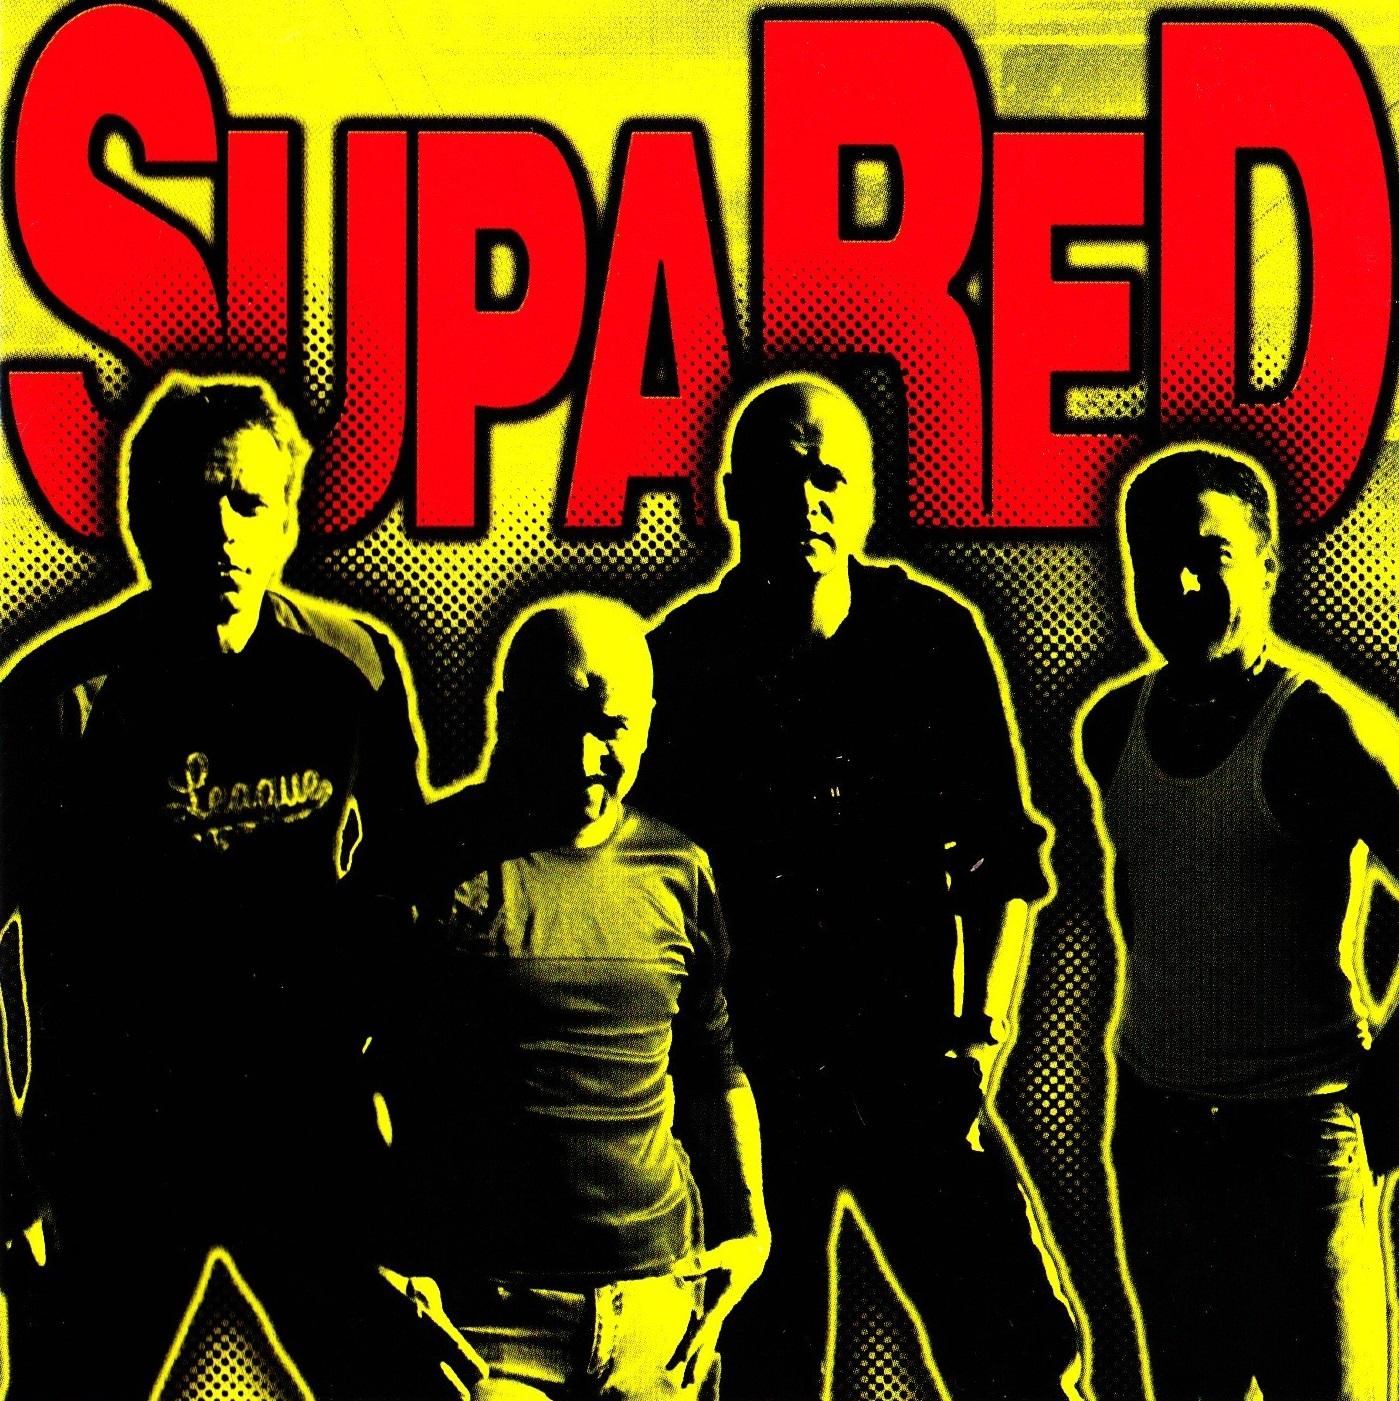 SupaRed — SupaRed (2003)